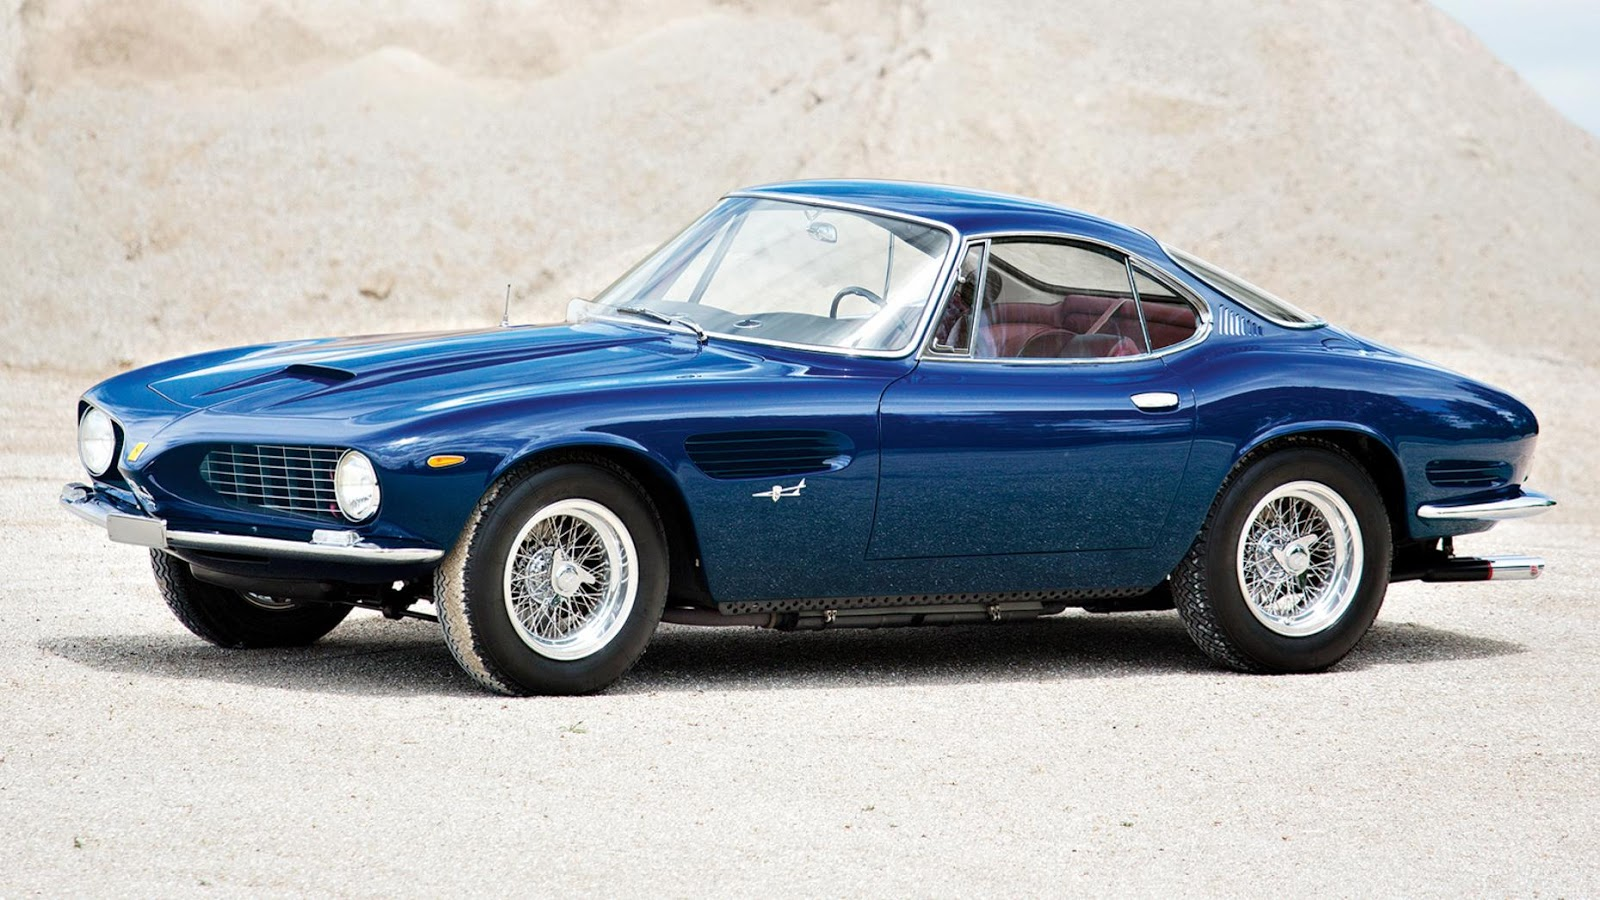 $16,500,000 – 1962 Ferrari 250 GT SWB Berlinetta Speciale